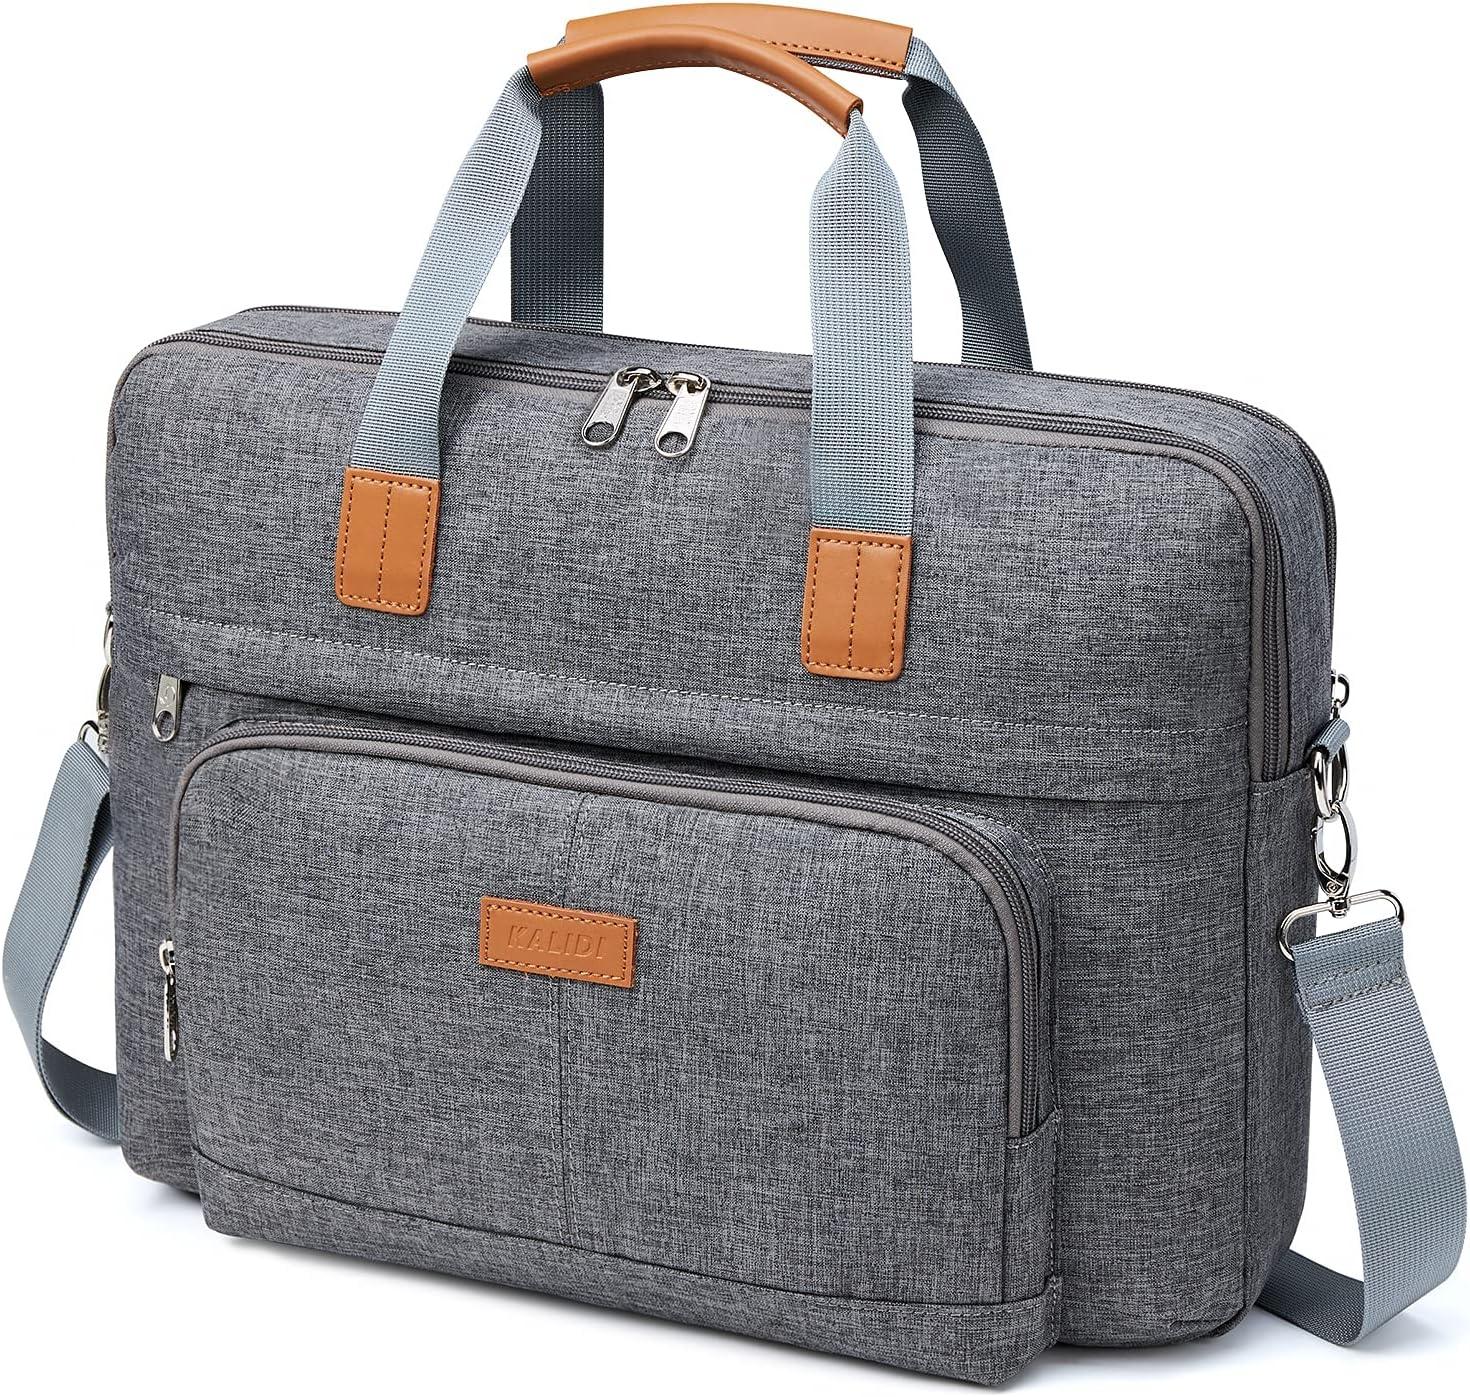 KALIDI Messenger Bag, 15.6 Inch Laptop Brief Shoulder Bag for MacBook Dell Alienware Lenovo HP Travel Business College Office (Grey, 14.5-16 inches)